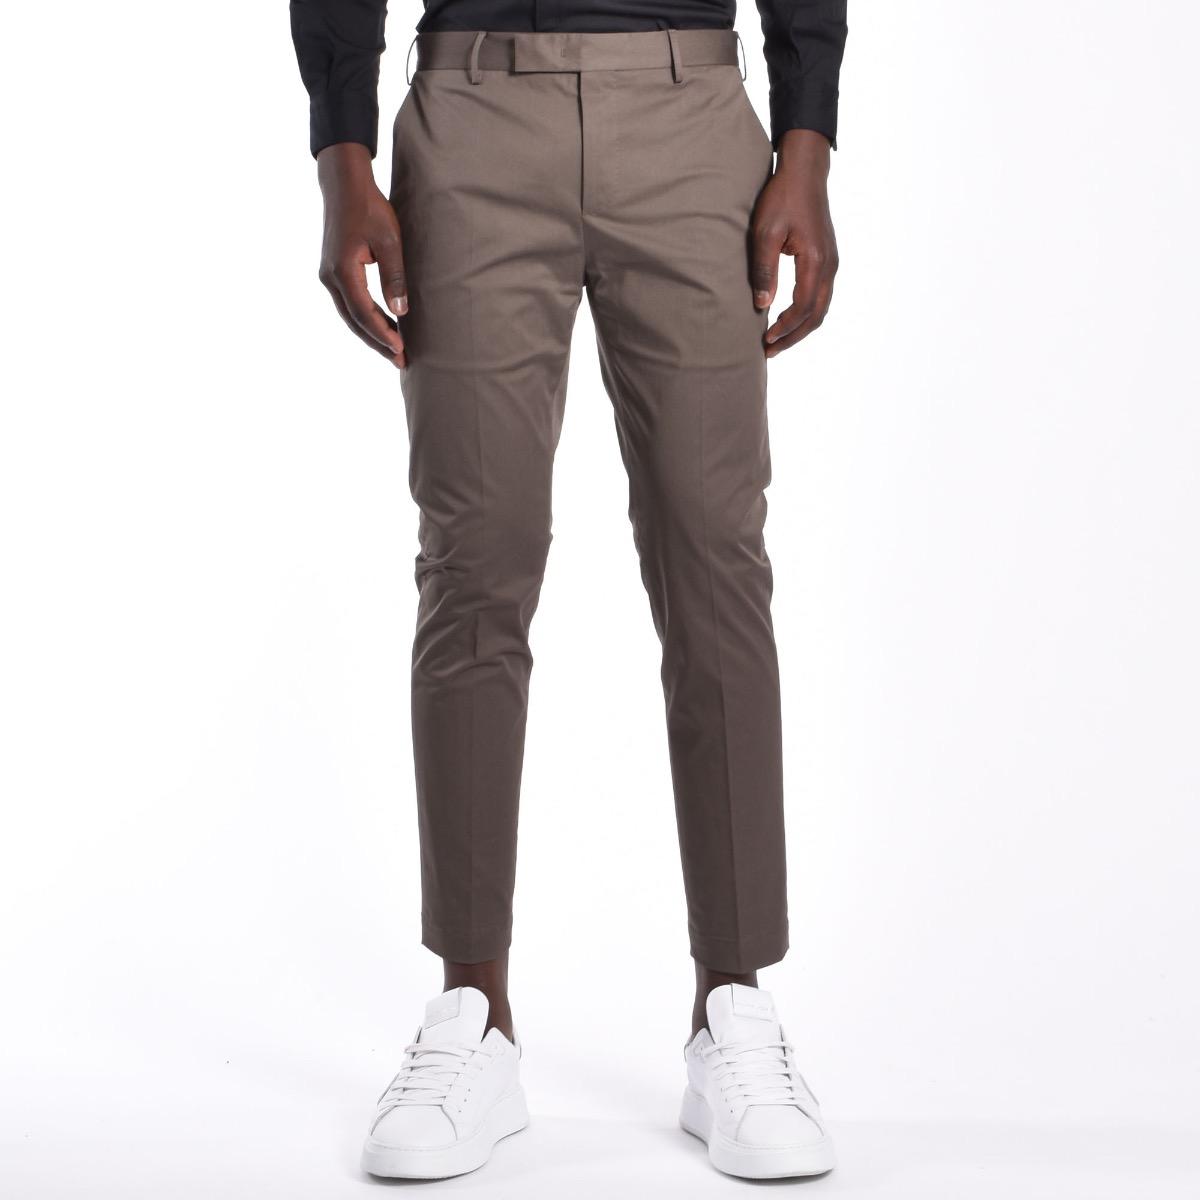 Pantalone pendente piuma - Tortora